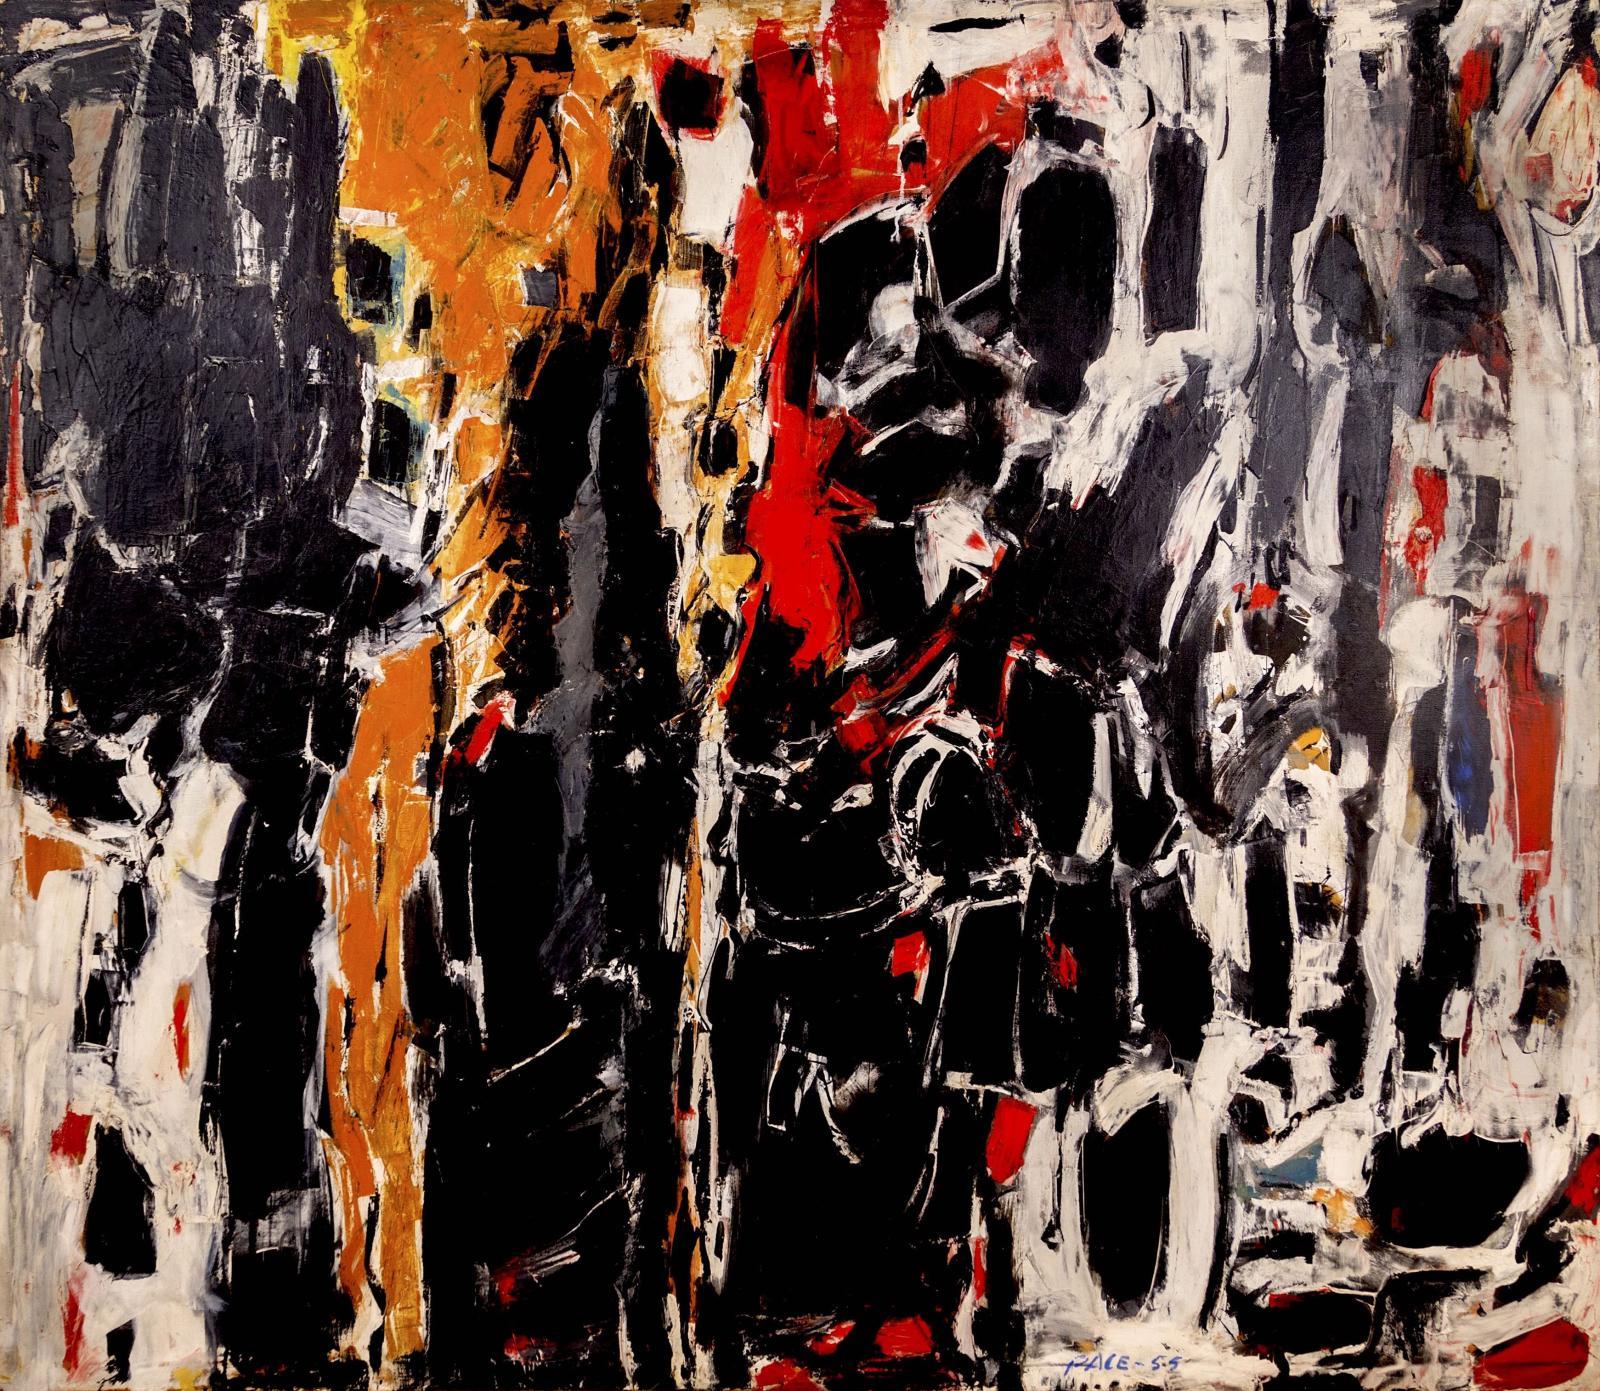 Stephen Pace, Sentinels, 1955